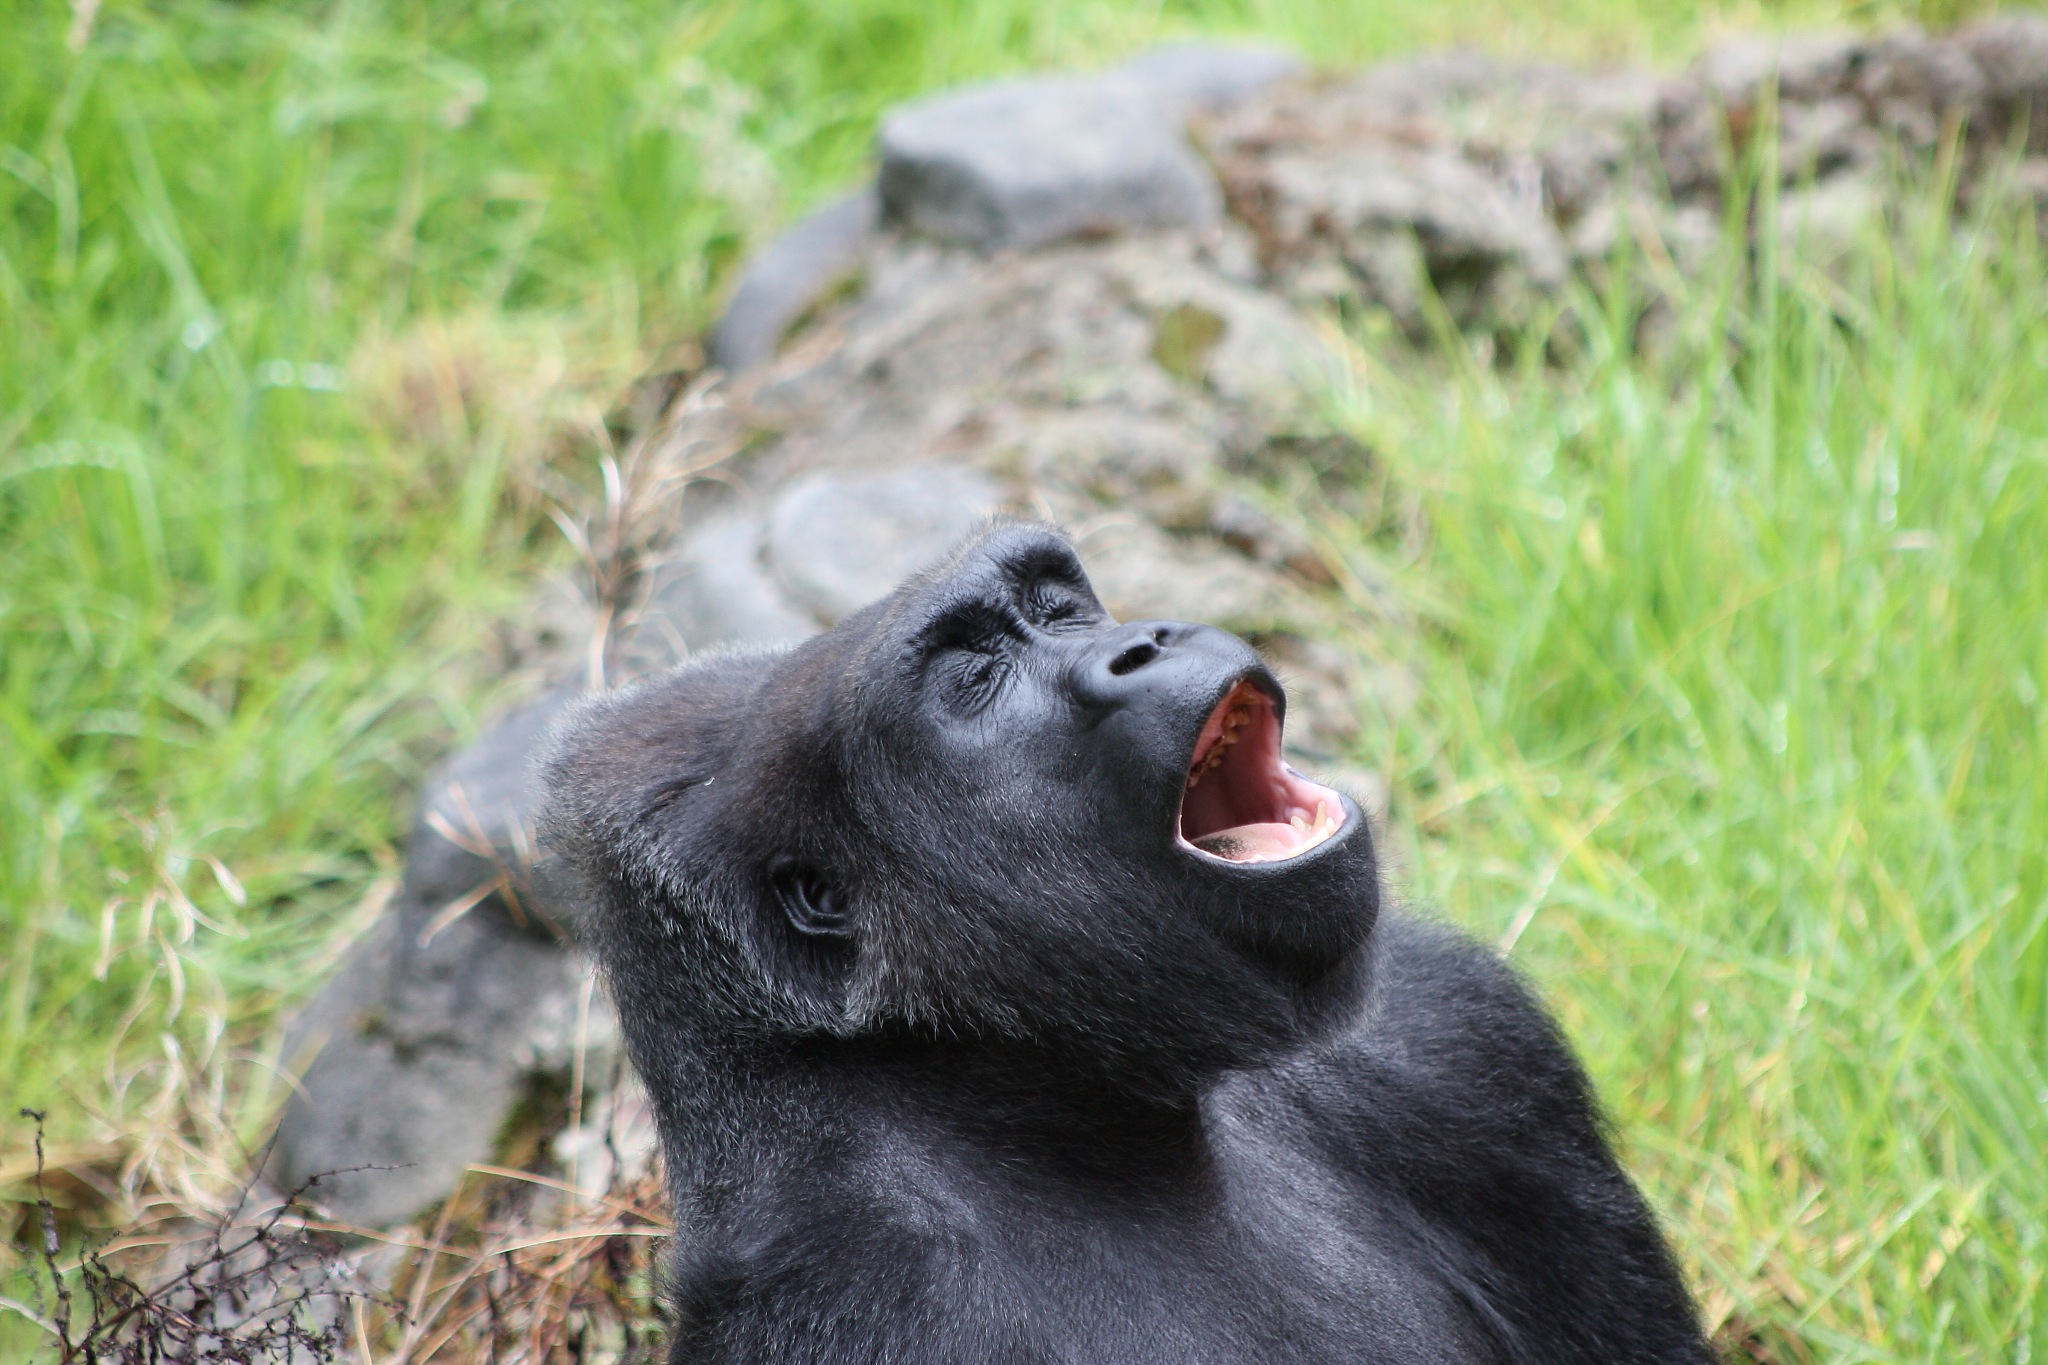 Singing Gorilla by Laurie Puglia